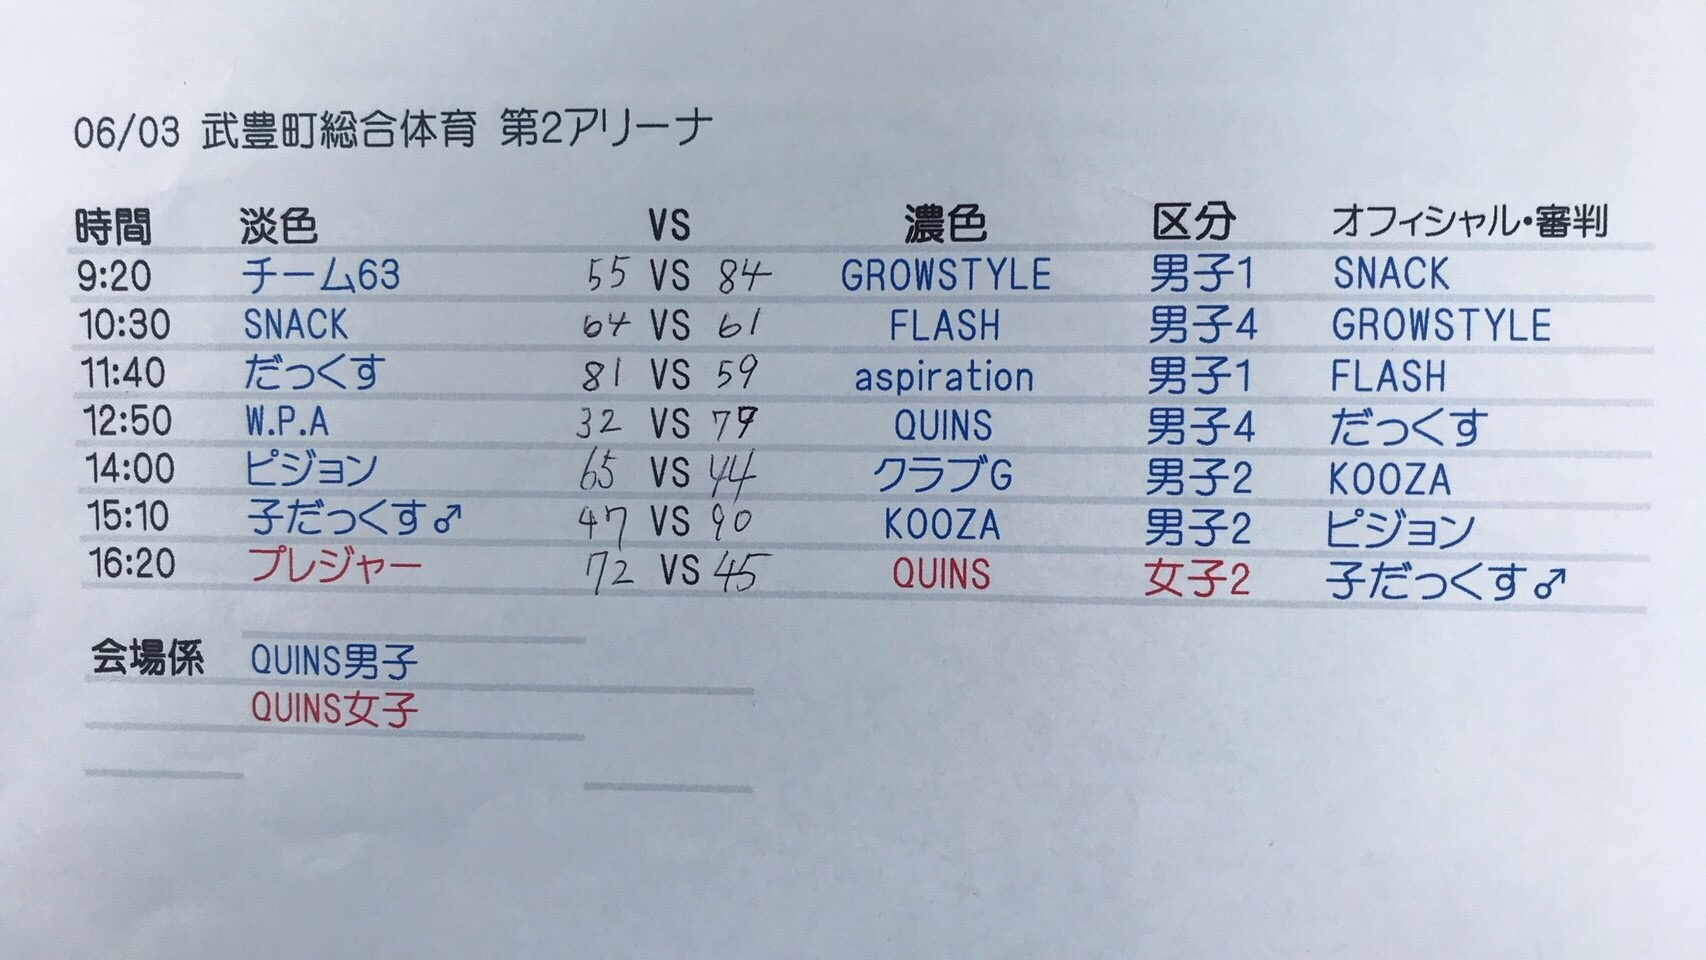 6C7BBE16-246E-43E5-B439-9BE849A013D5